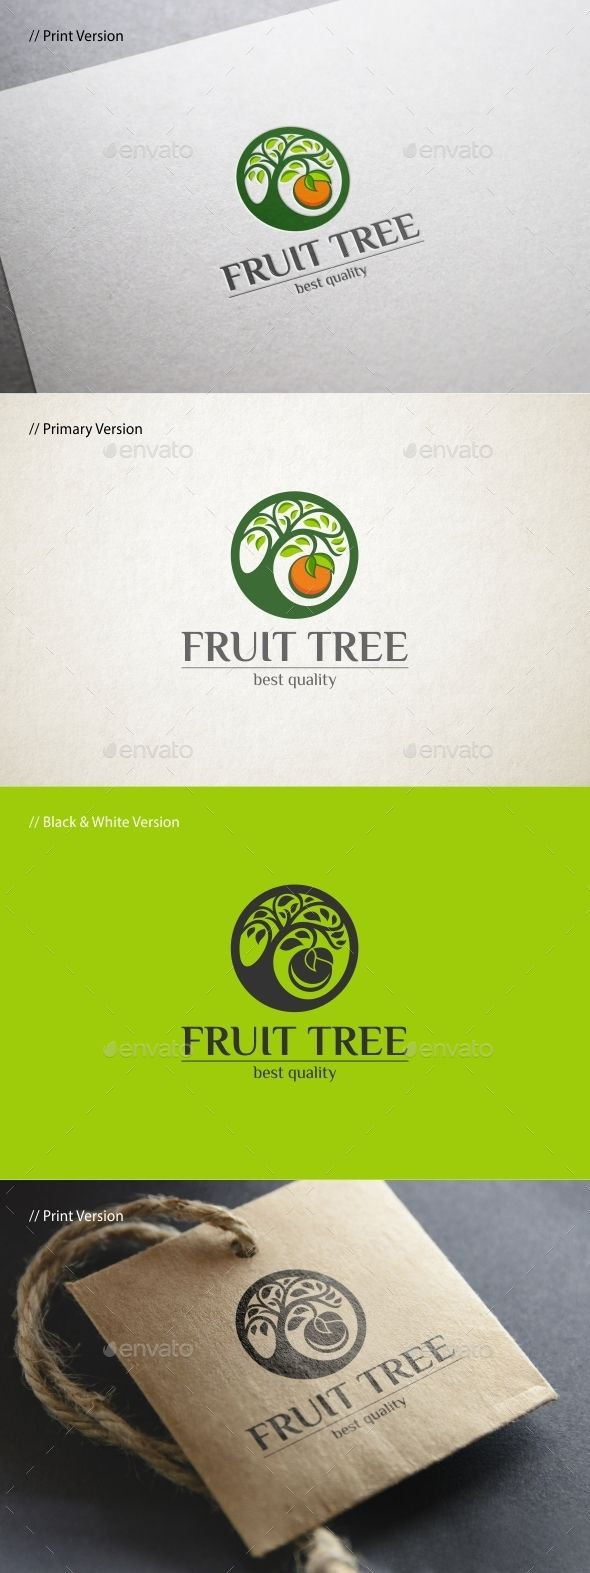 Fruit Tree Logo Template